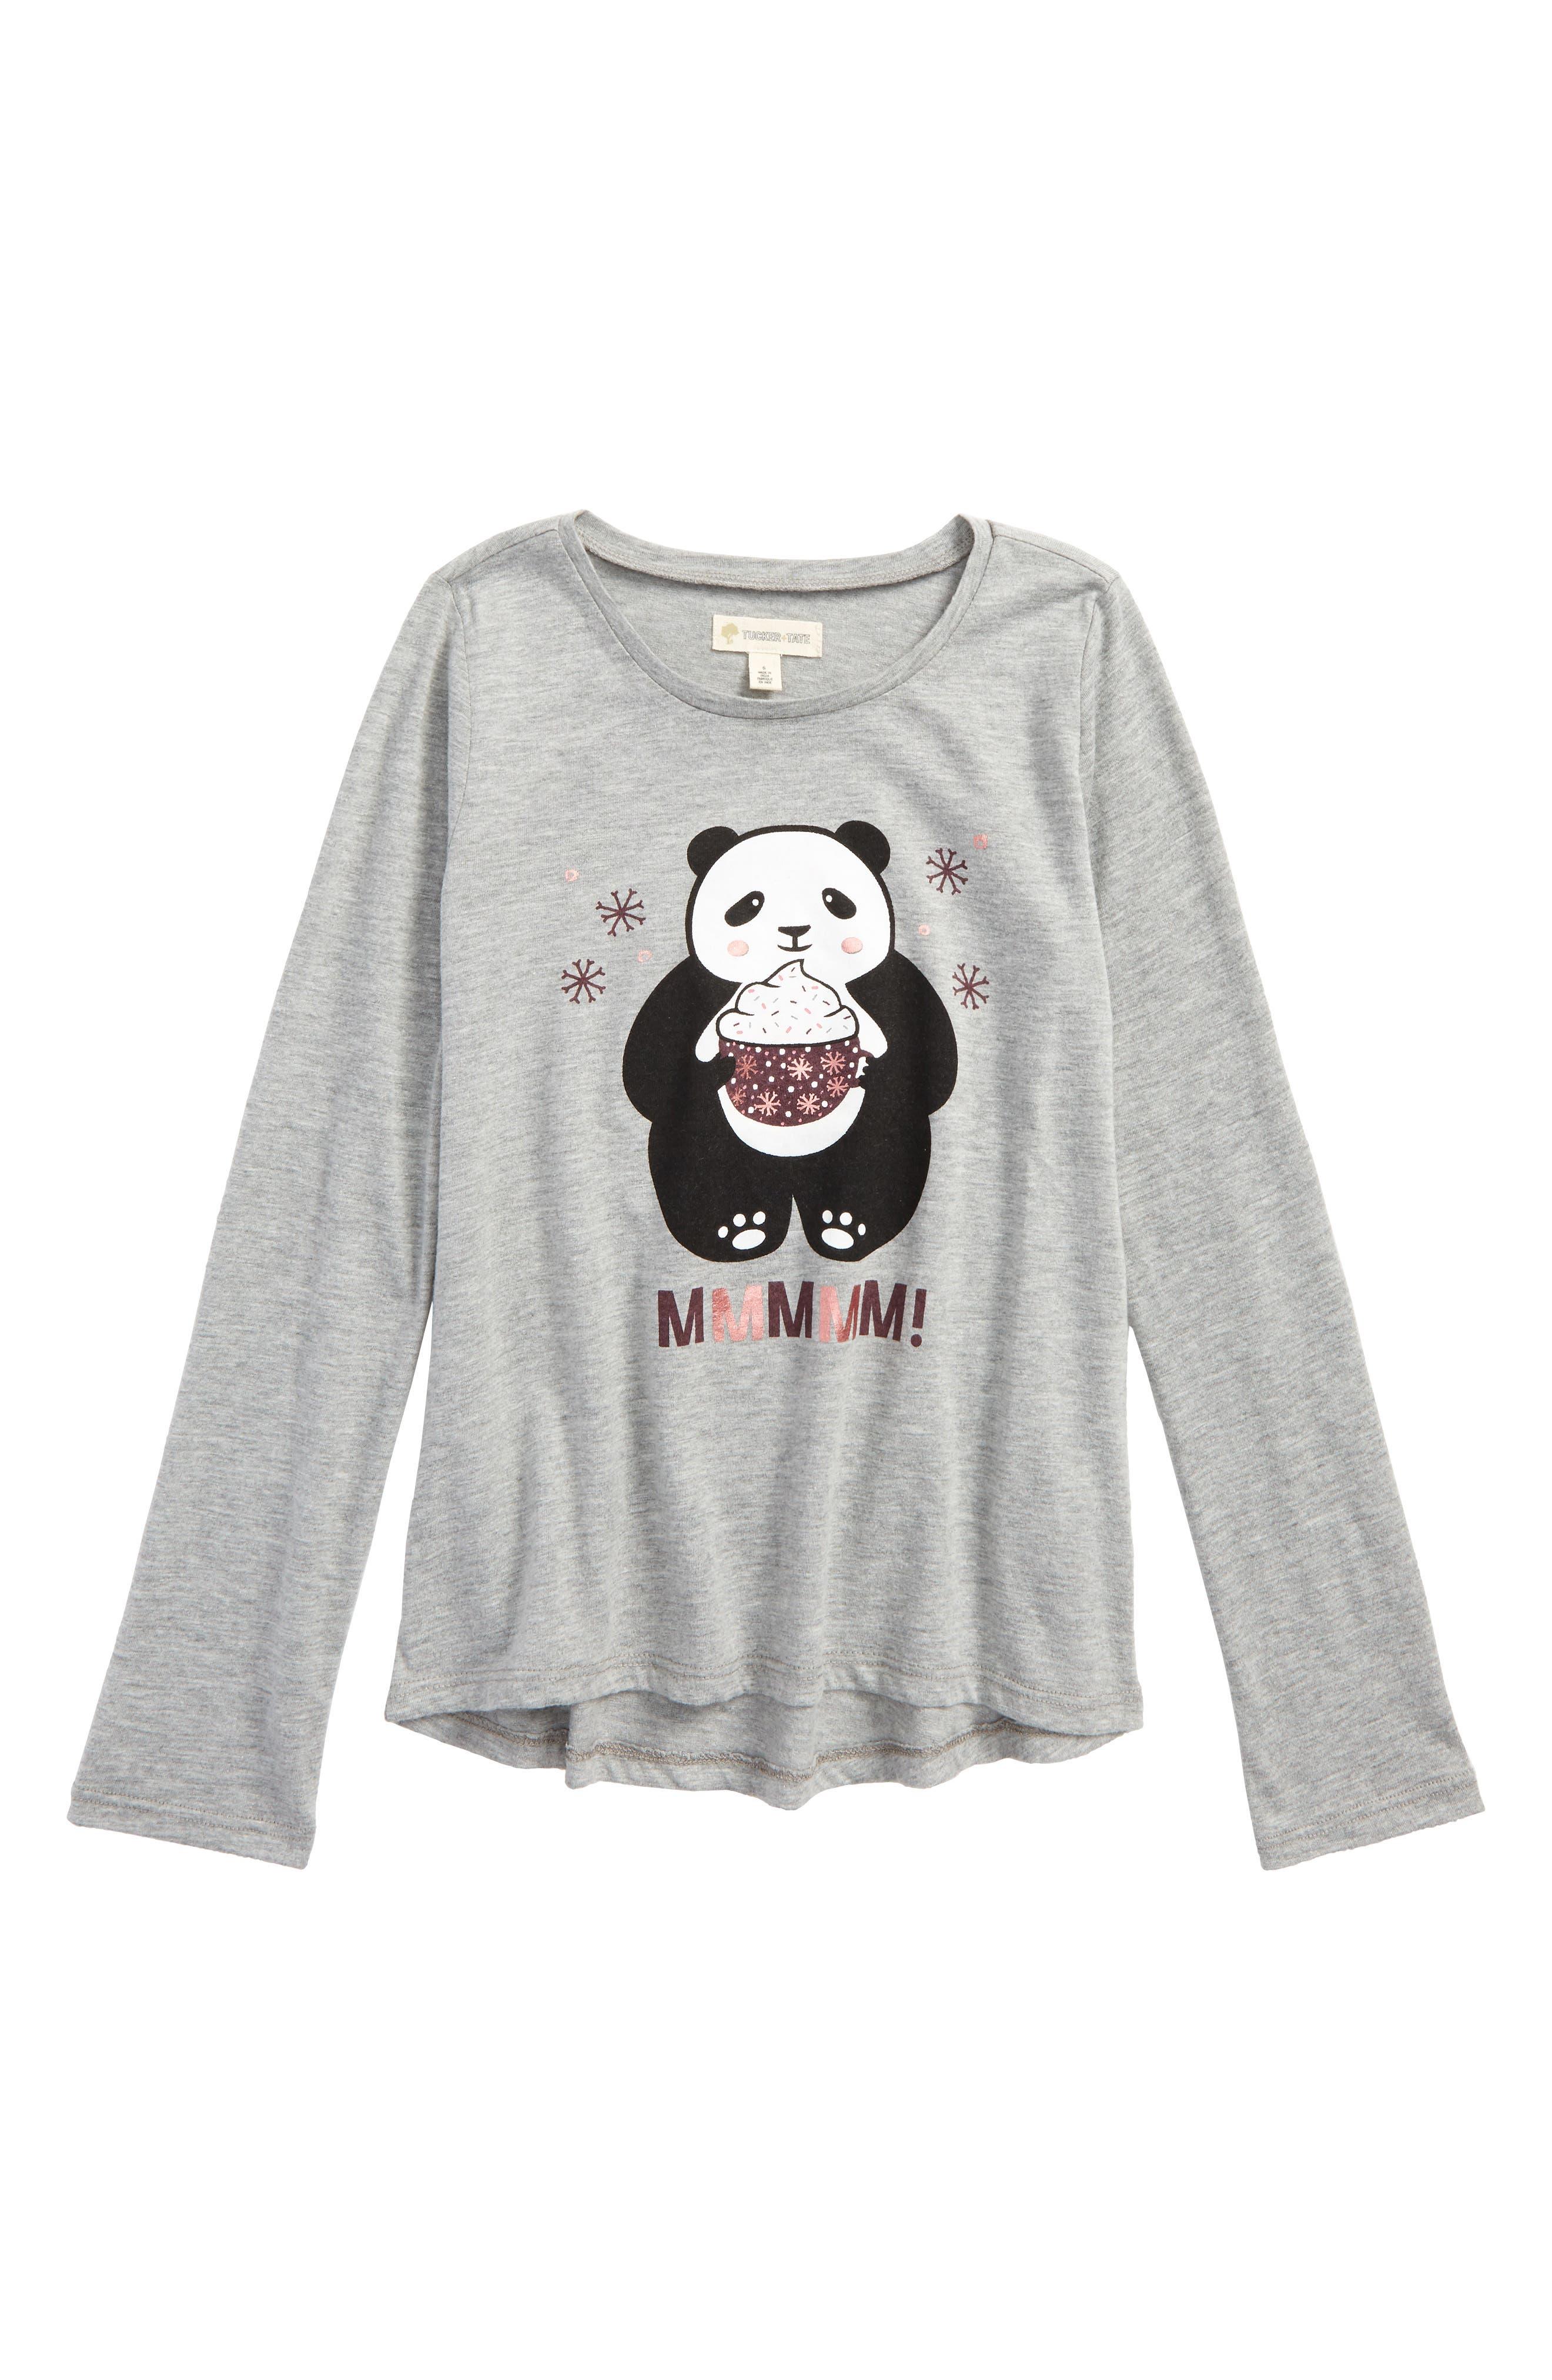 Graphic Tee,                         Main,                         color, Grey Medium Heather Cute Panda